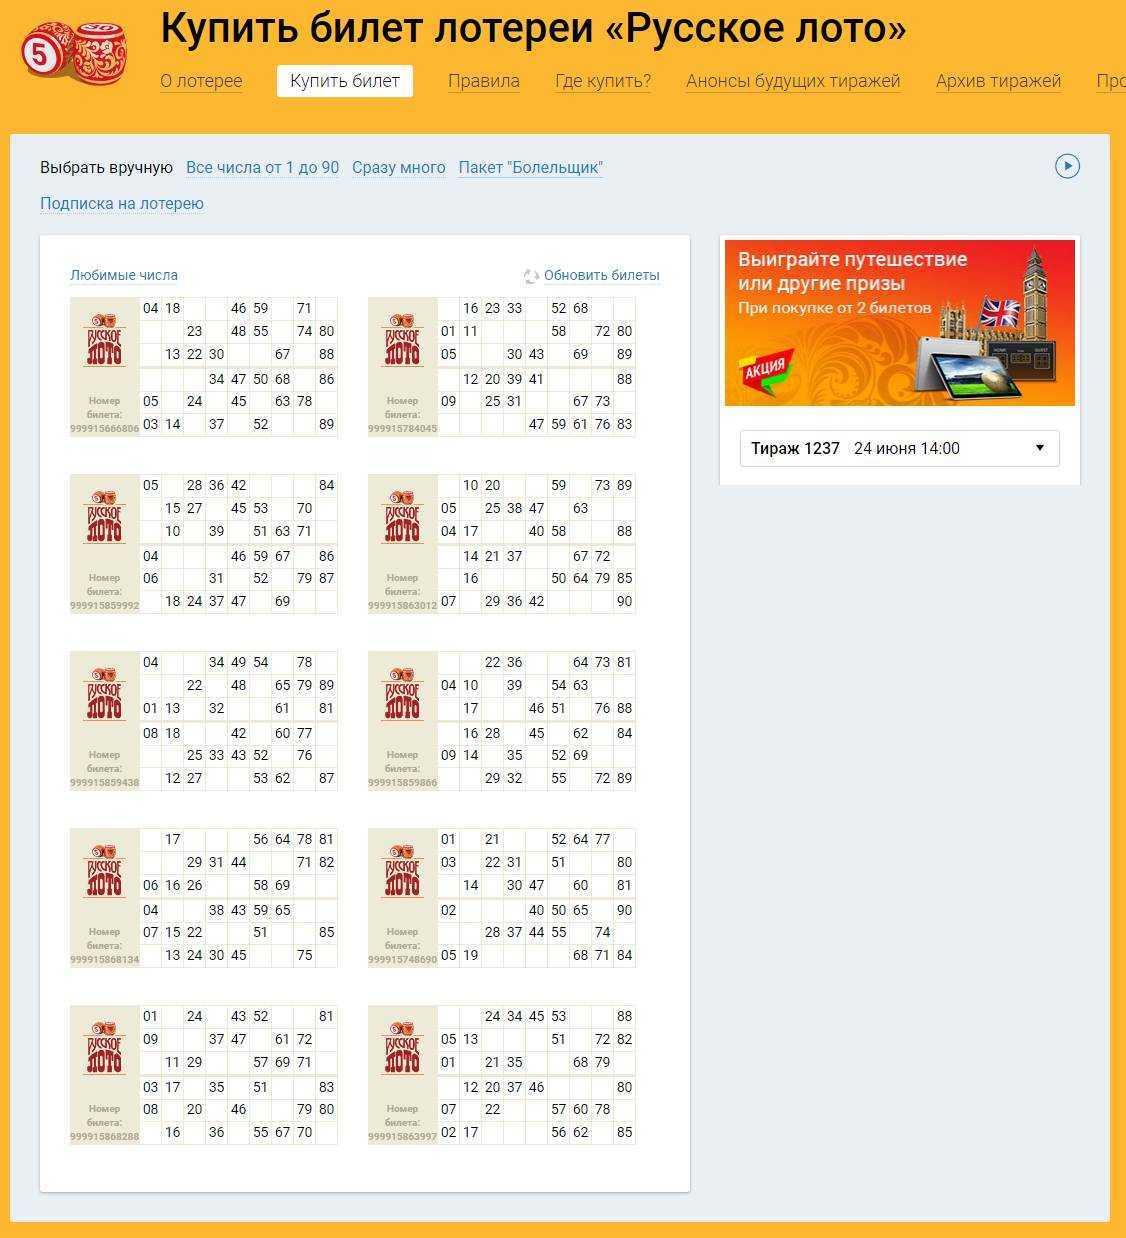 Bilhetes de loteria russos